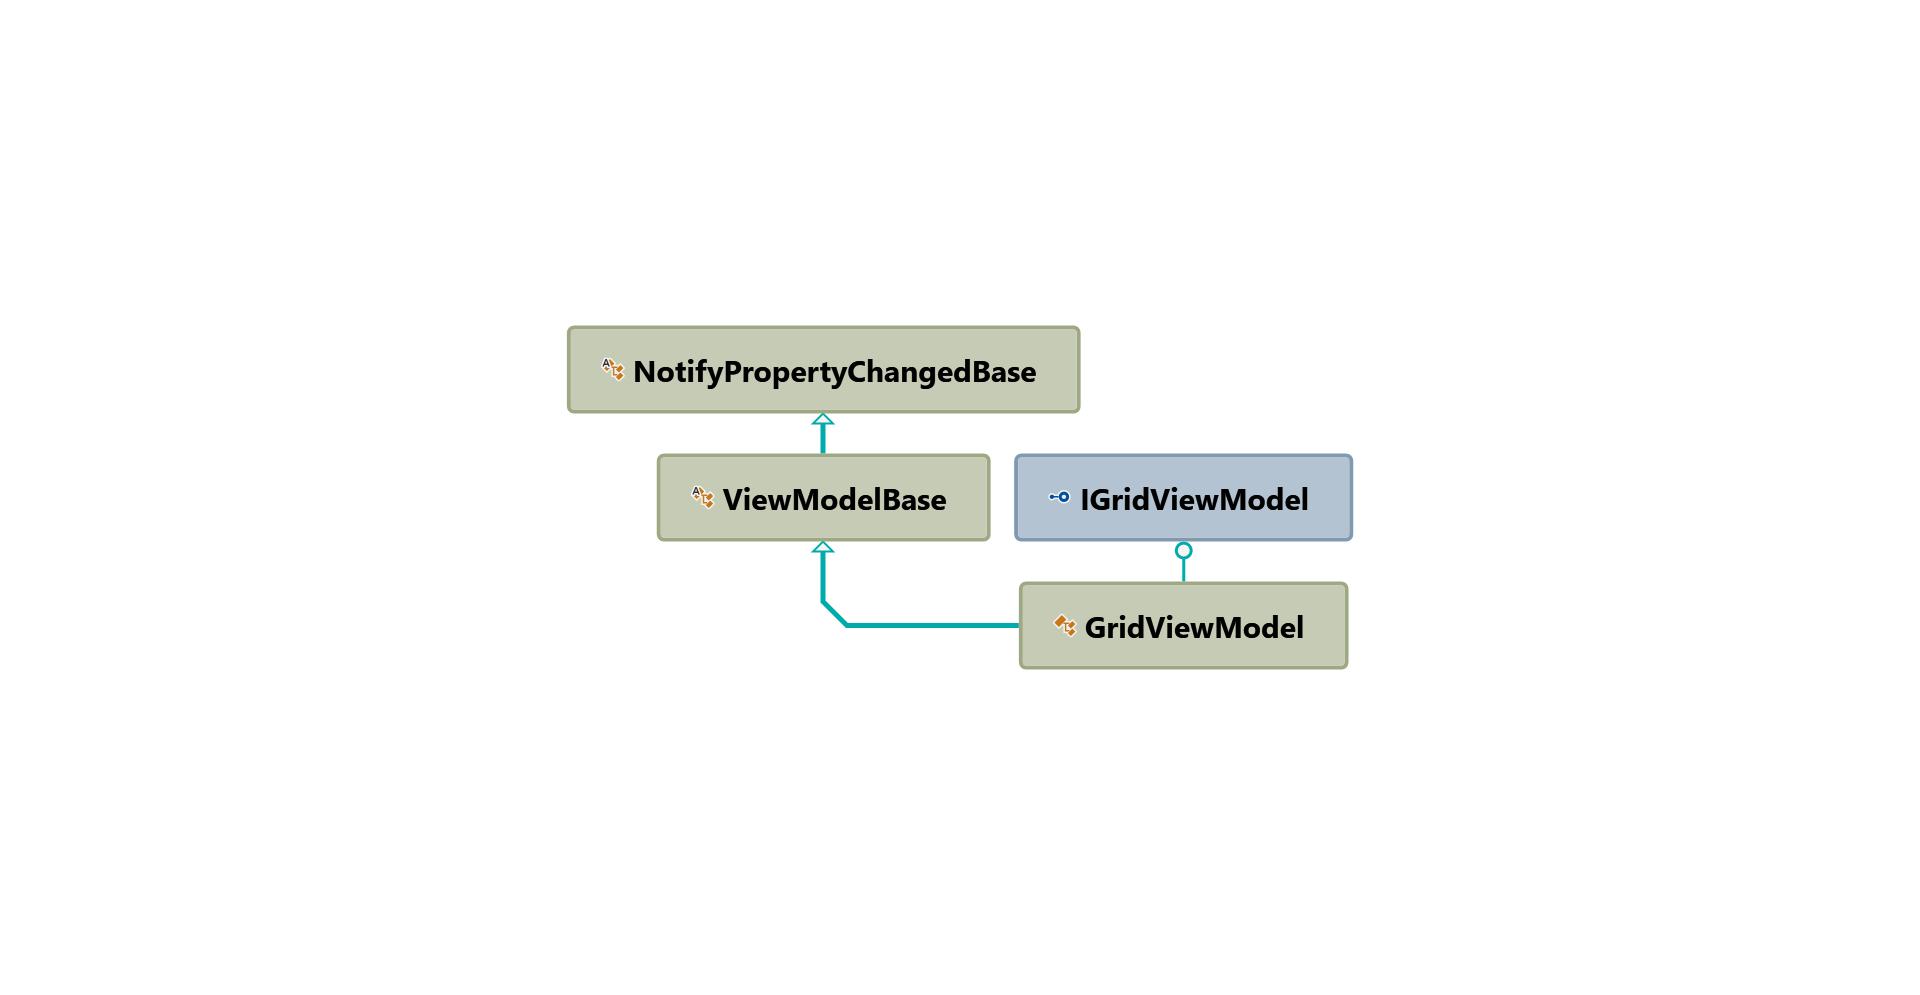 GridViewModel inheritance hierarchy diagram